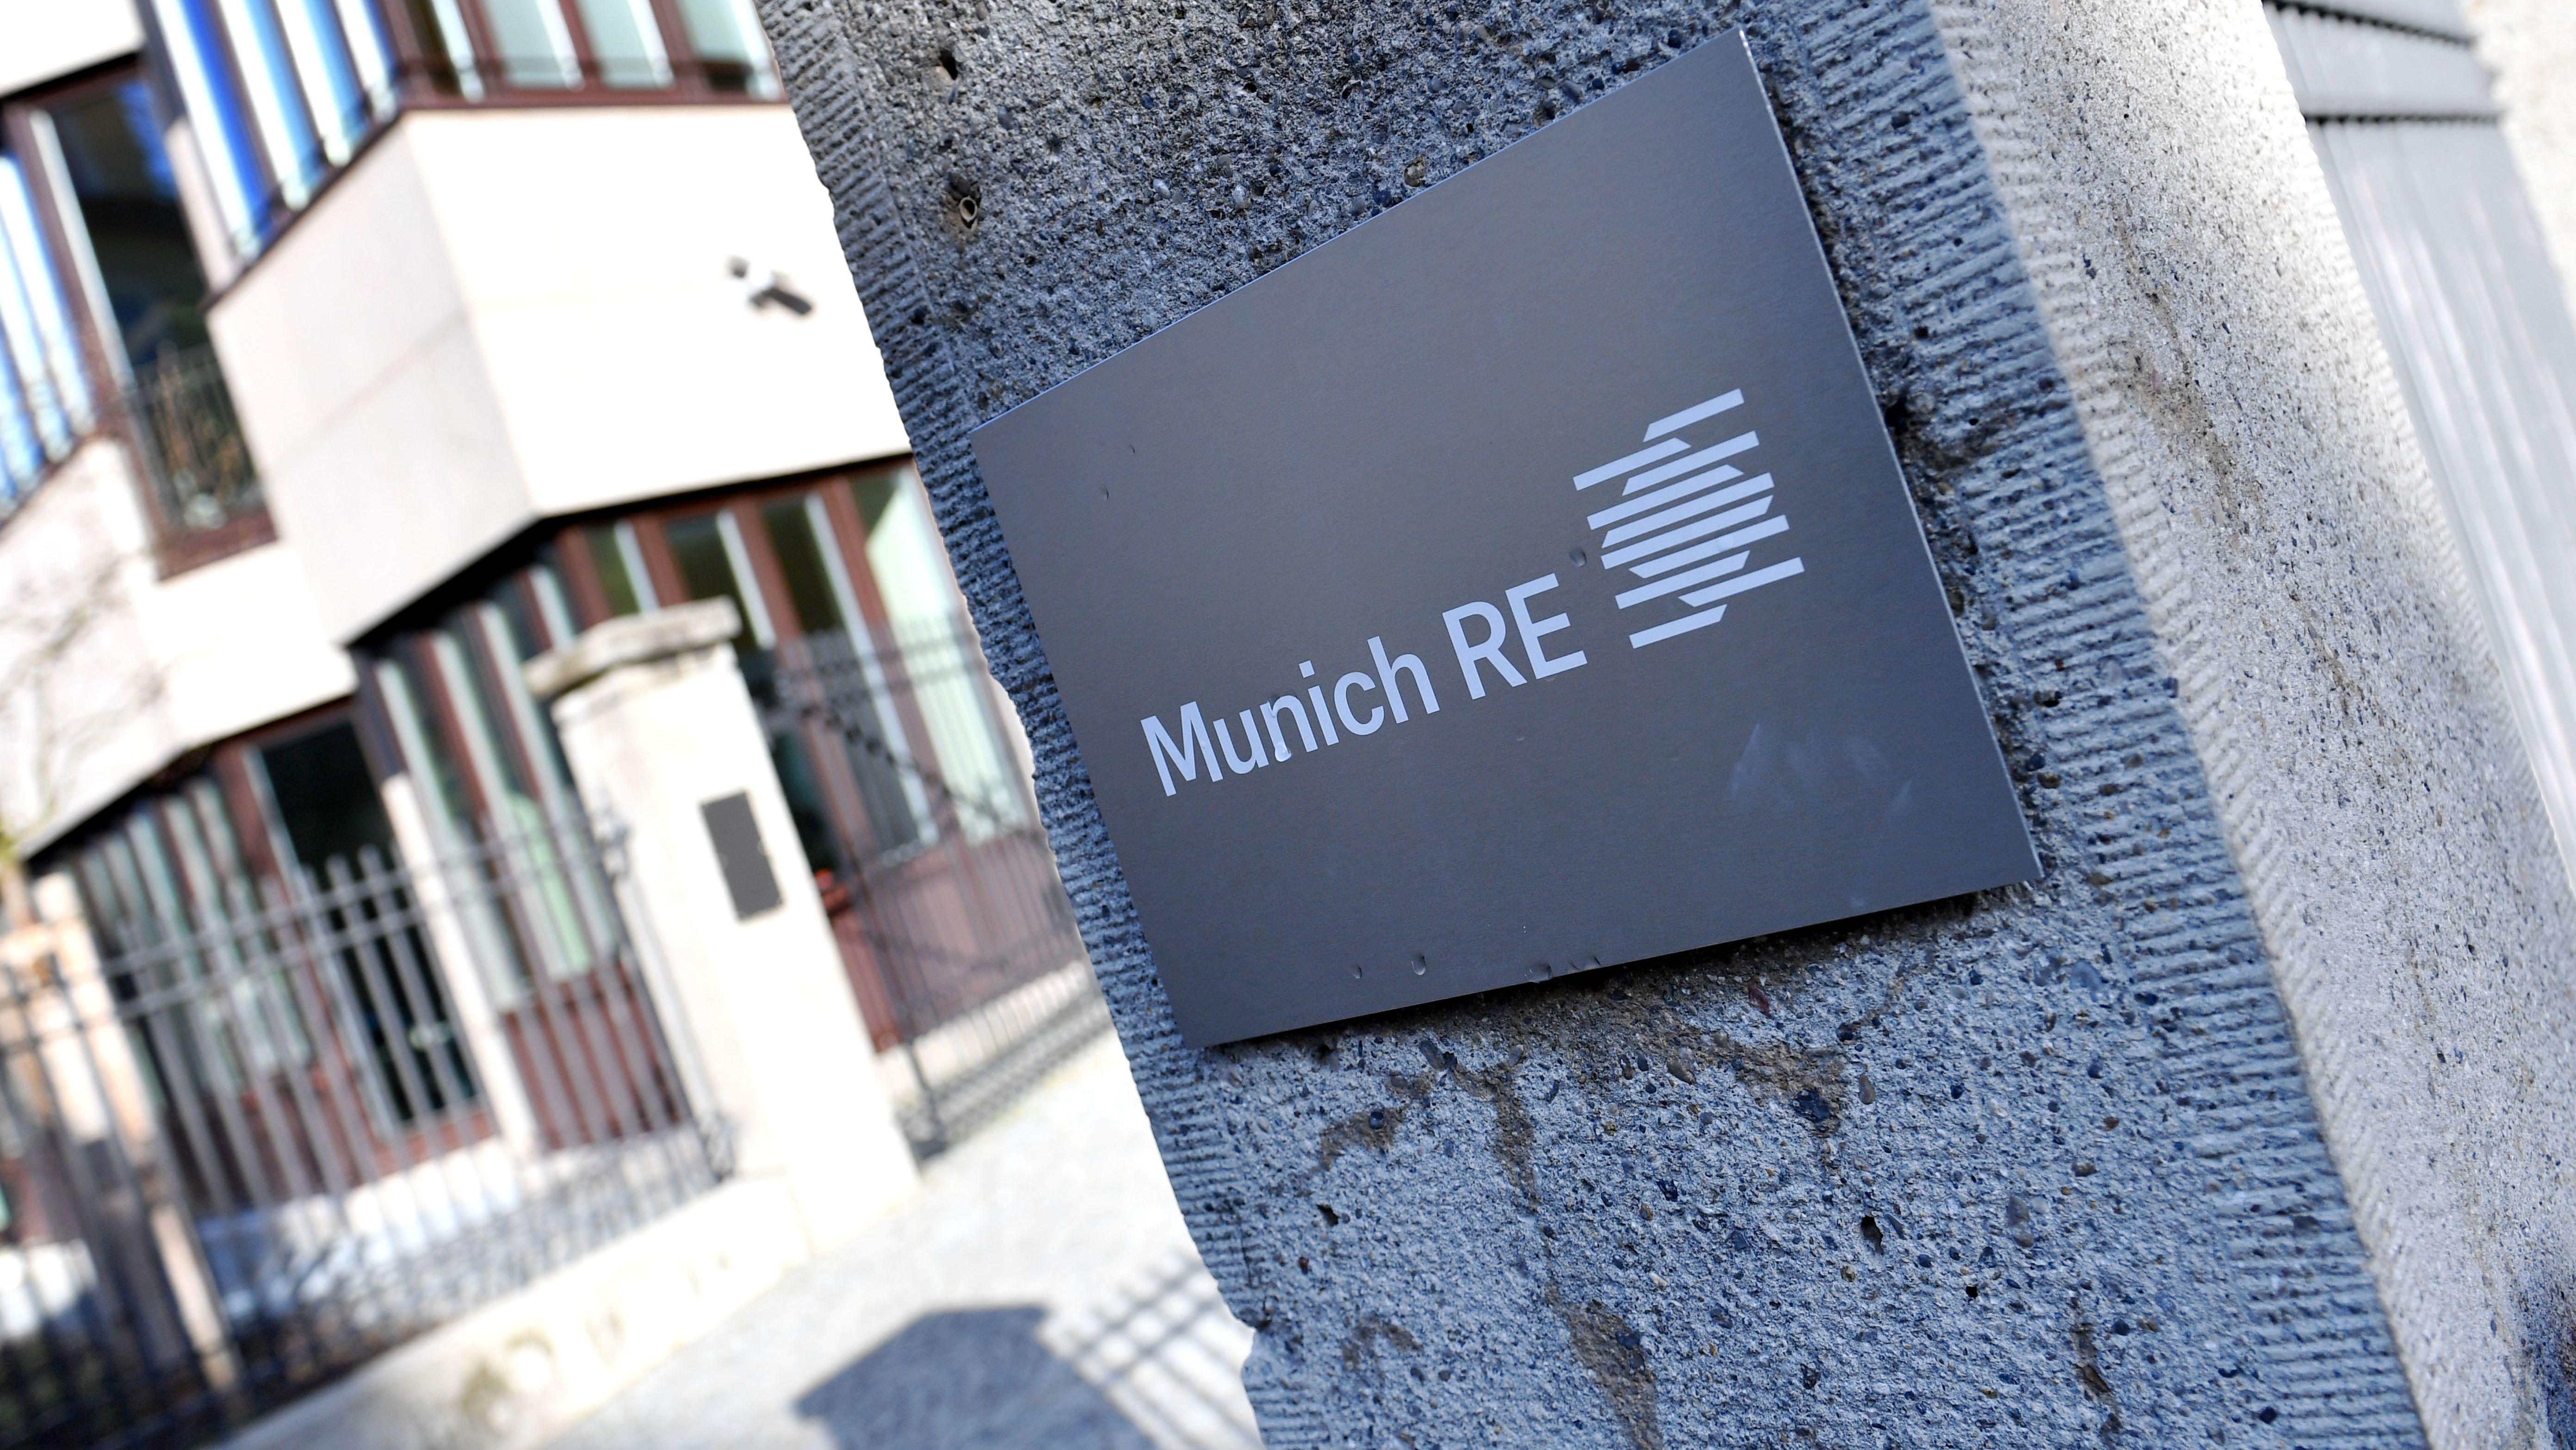 Firmenschild Munich Re